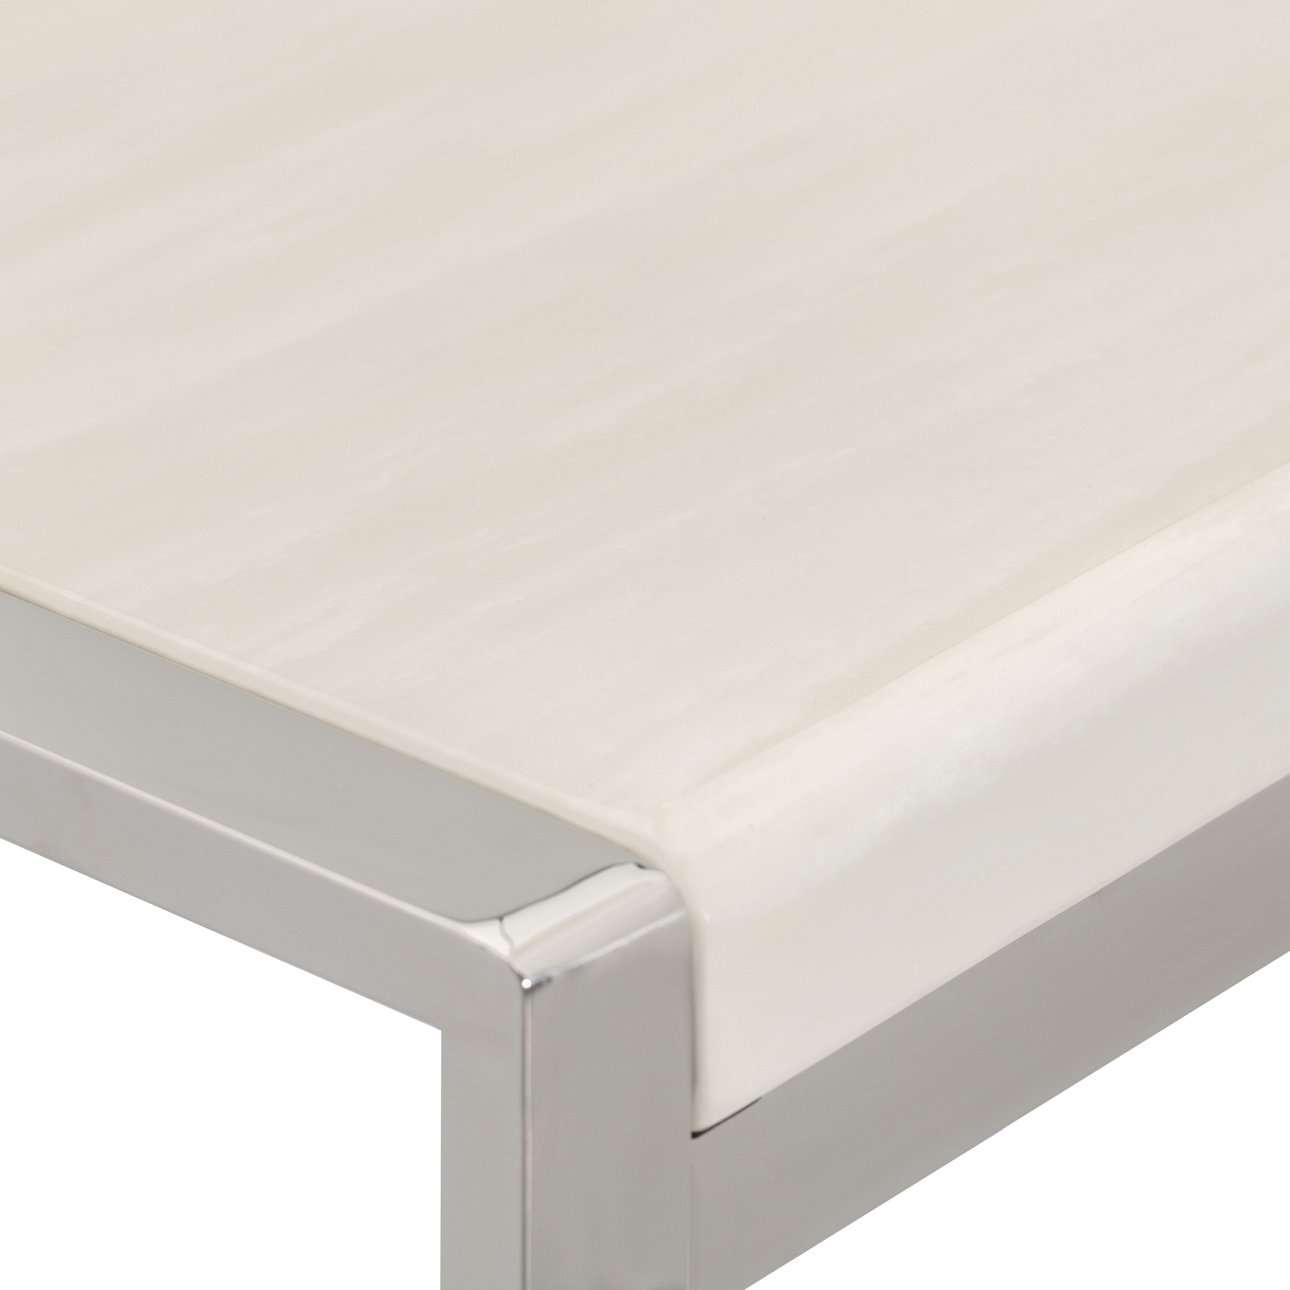 Sidetable Chianti marble ivory white 120x40x80cm